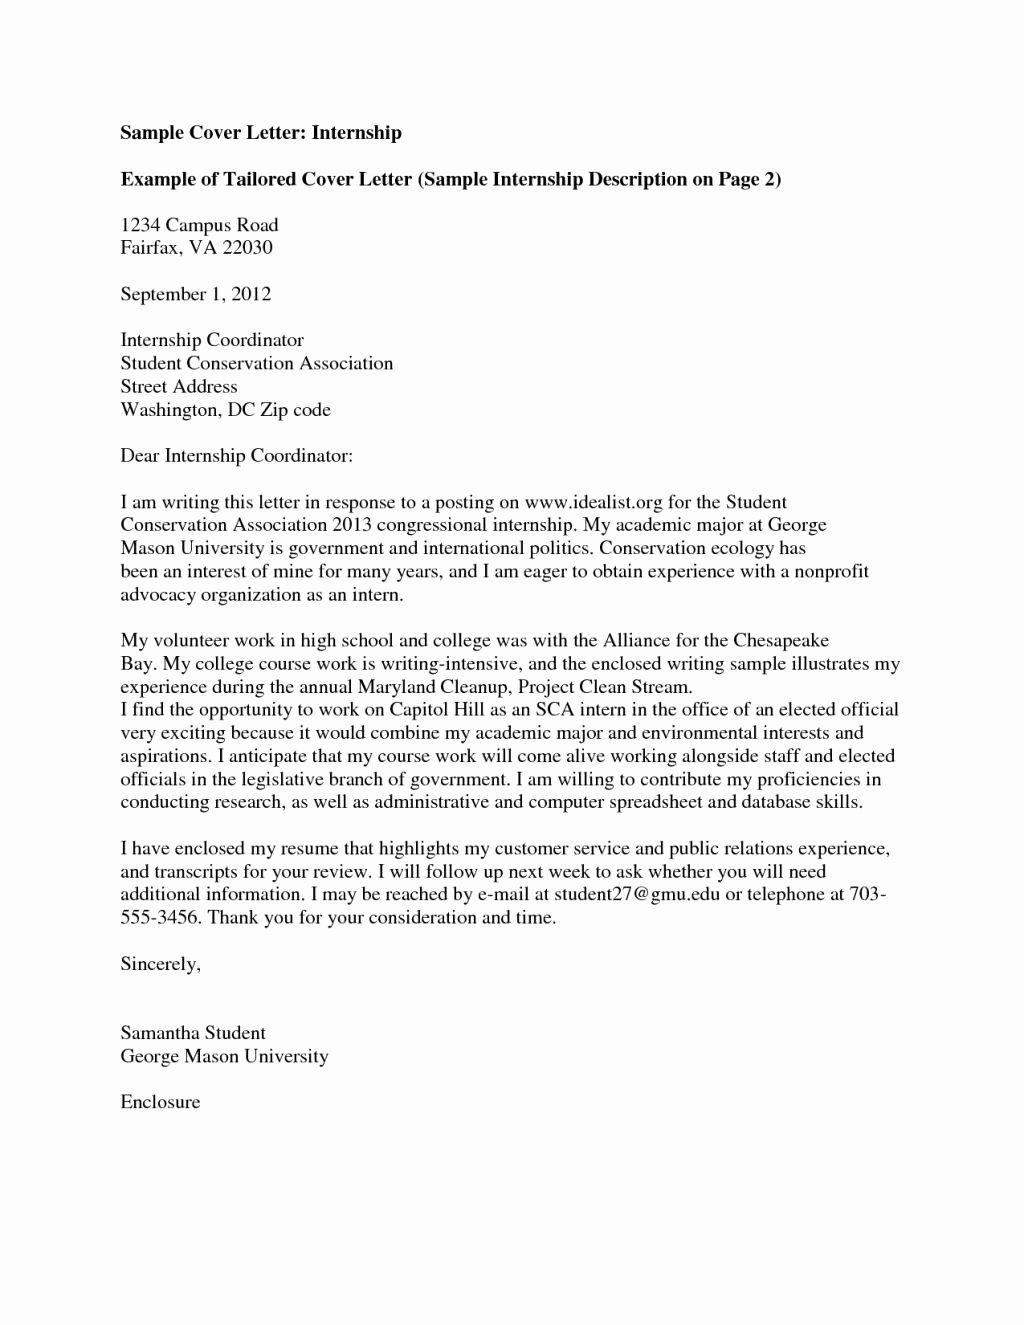 Cover Letter format Internship Unique Cover Letter Uk 2013